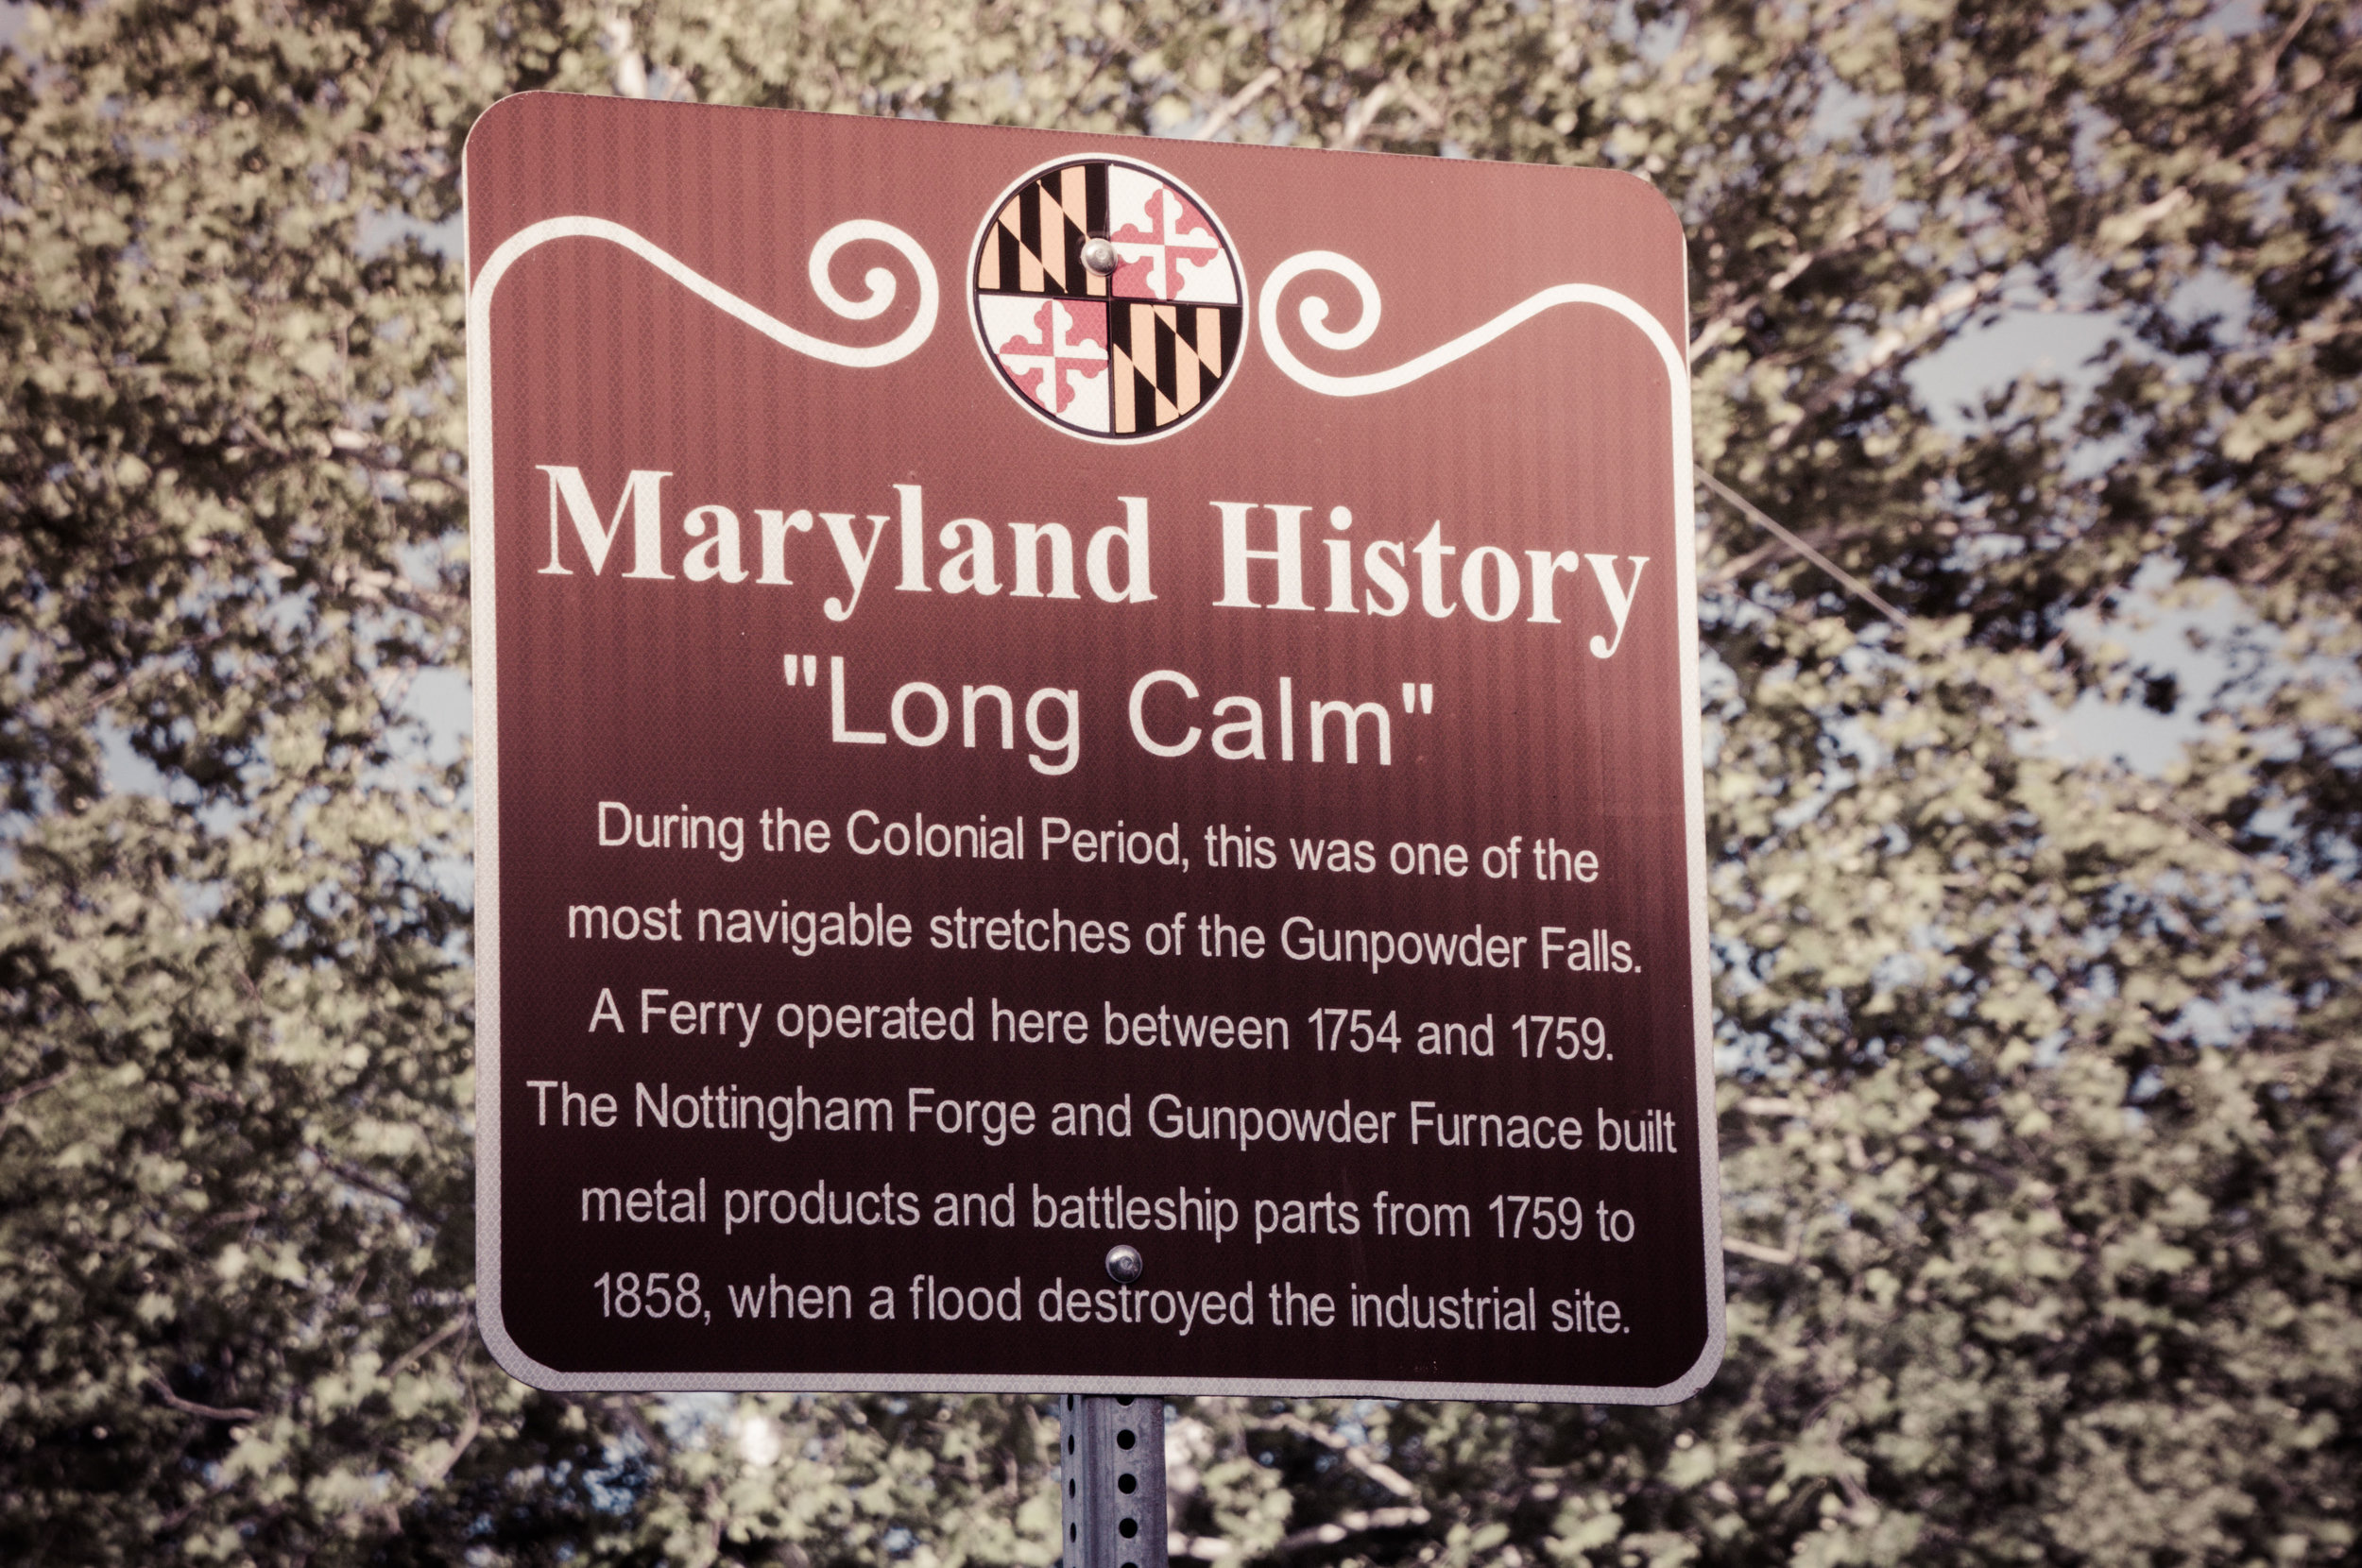 Long Calm Historical Marker